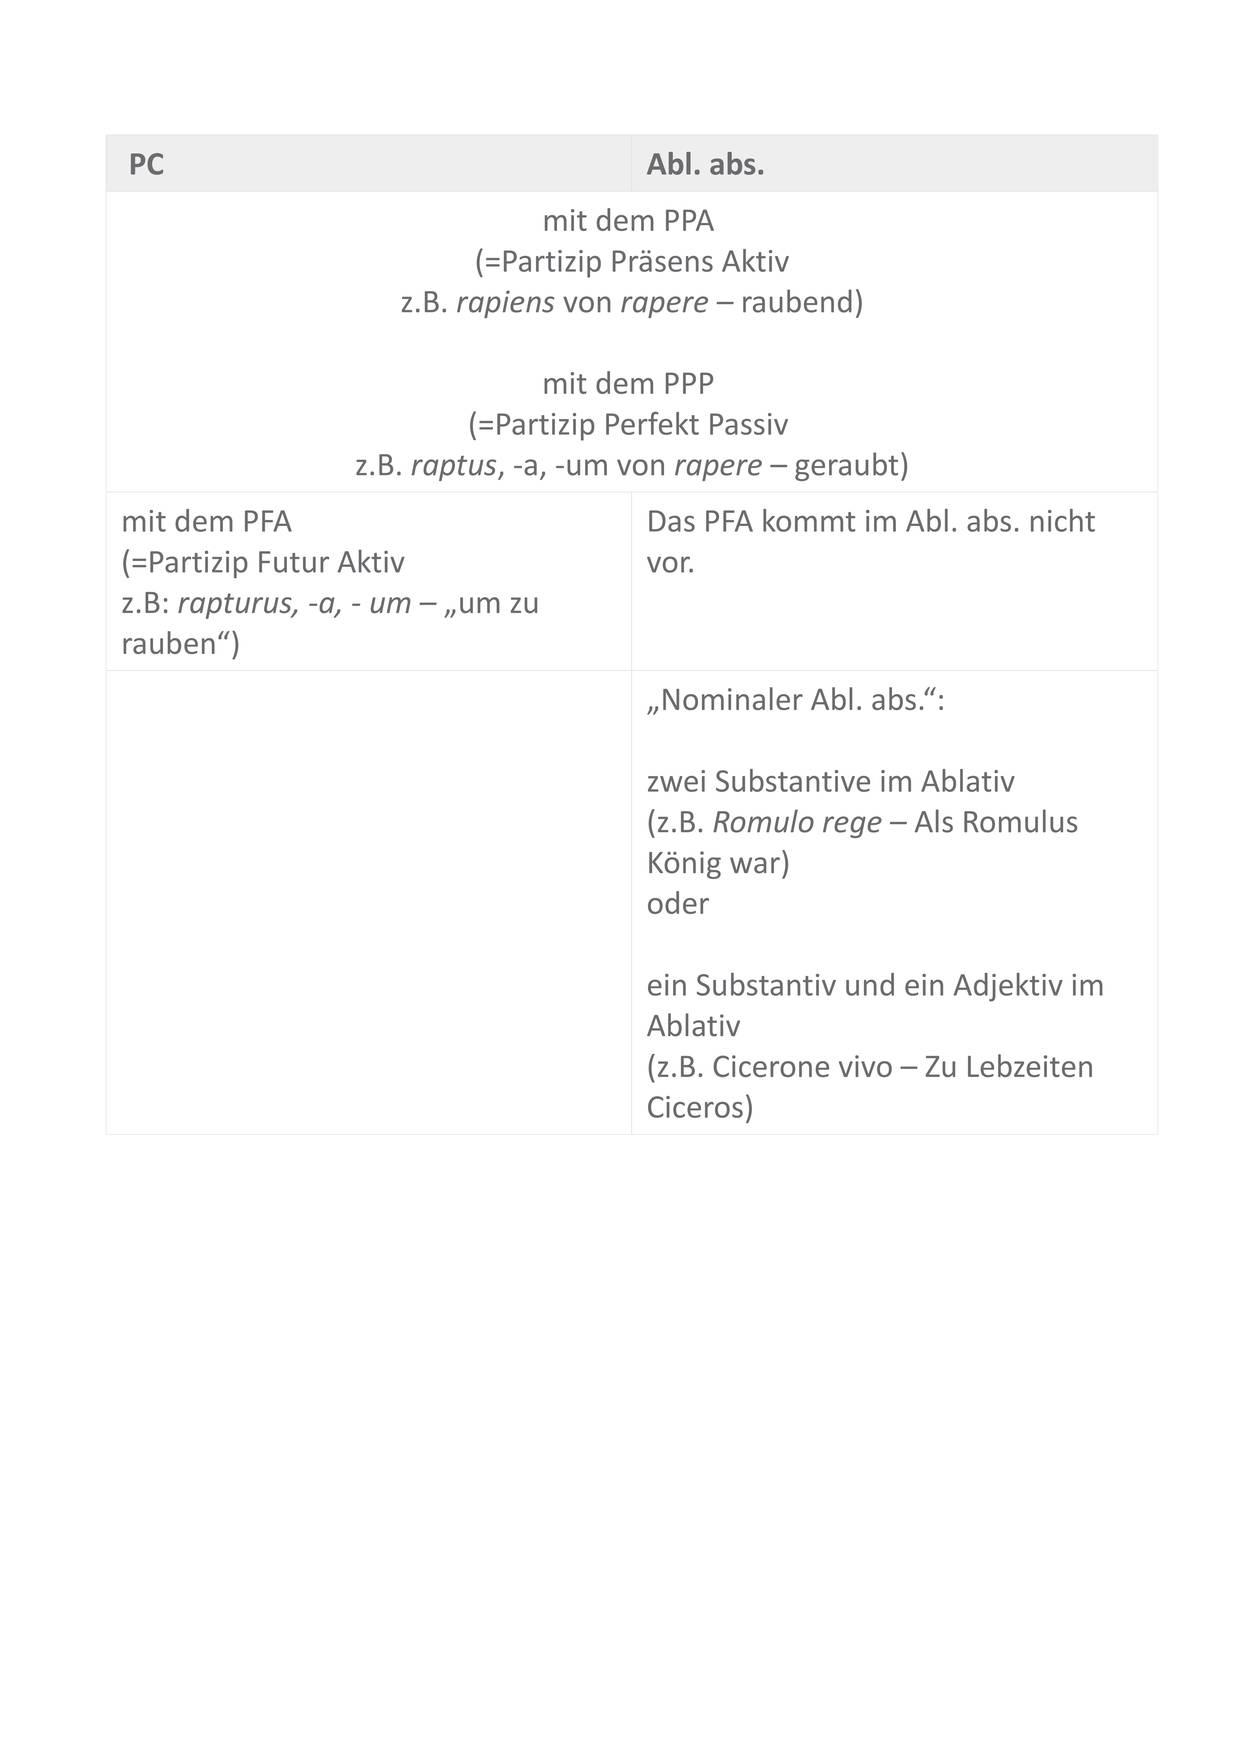 Tabelle_BILDUNG_Abl._abs-PC_Sofatutor.jpg